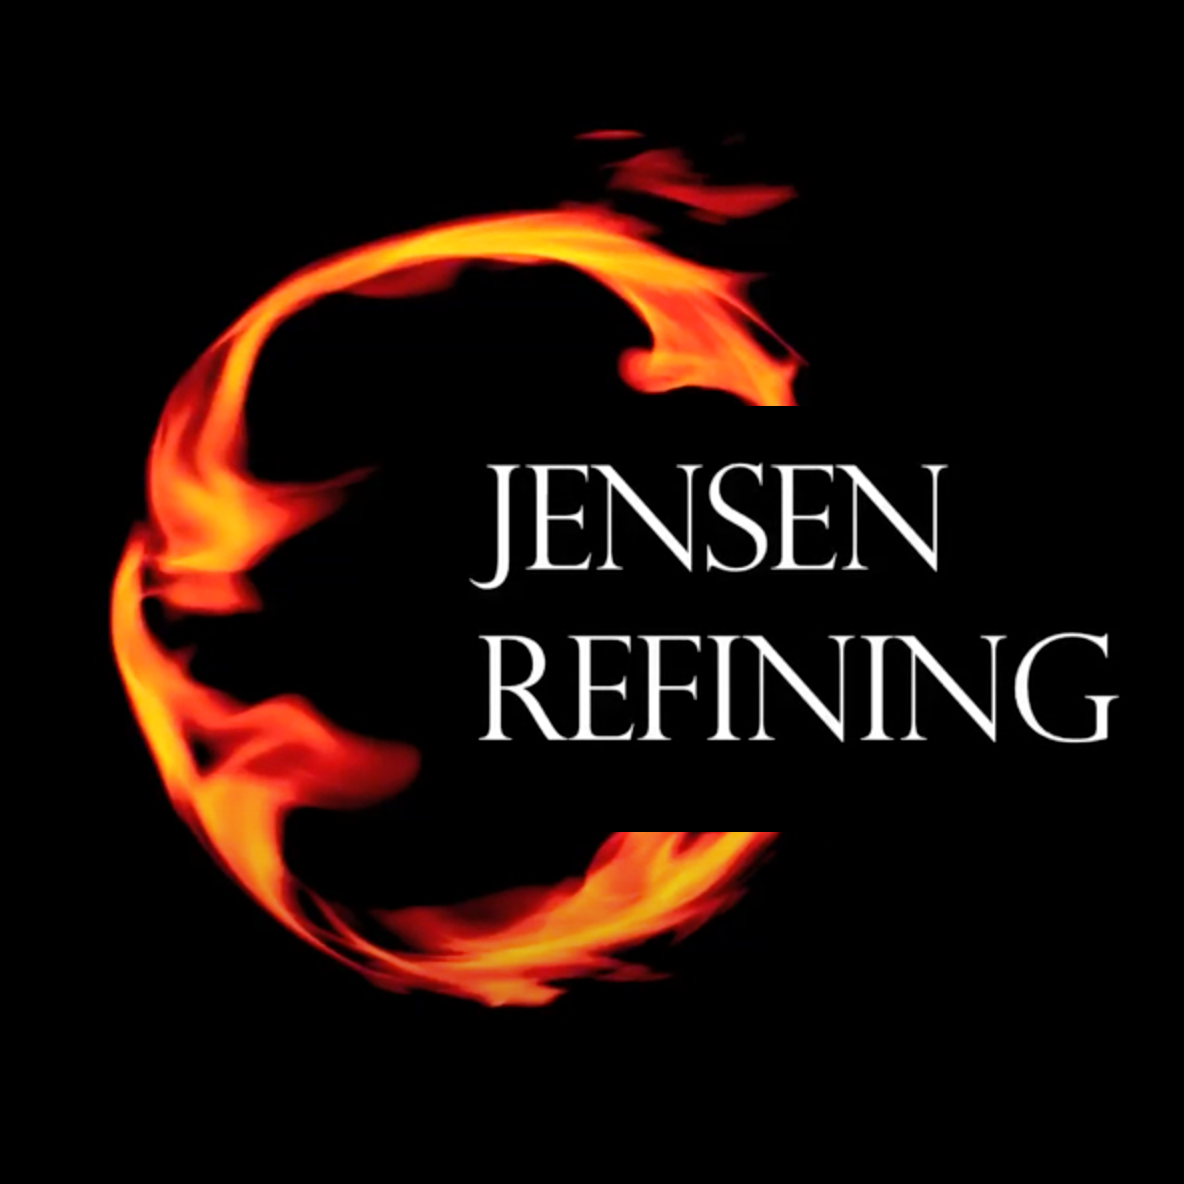 JENSEN REFINING